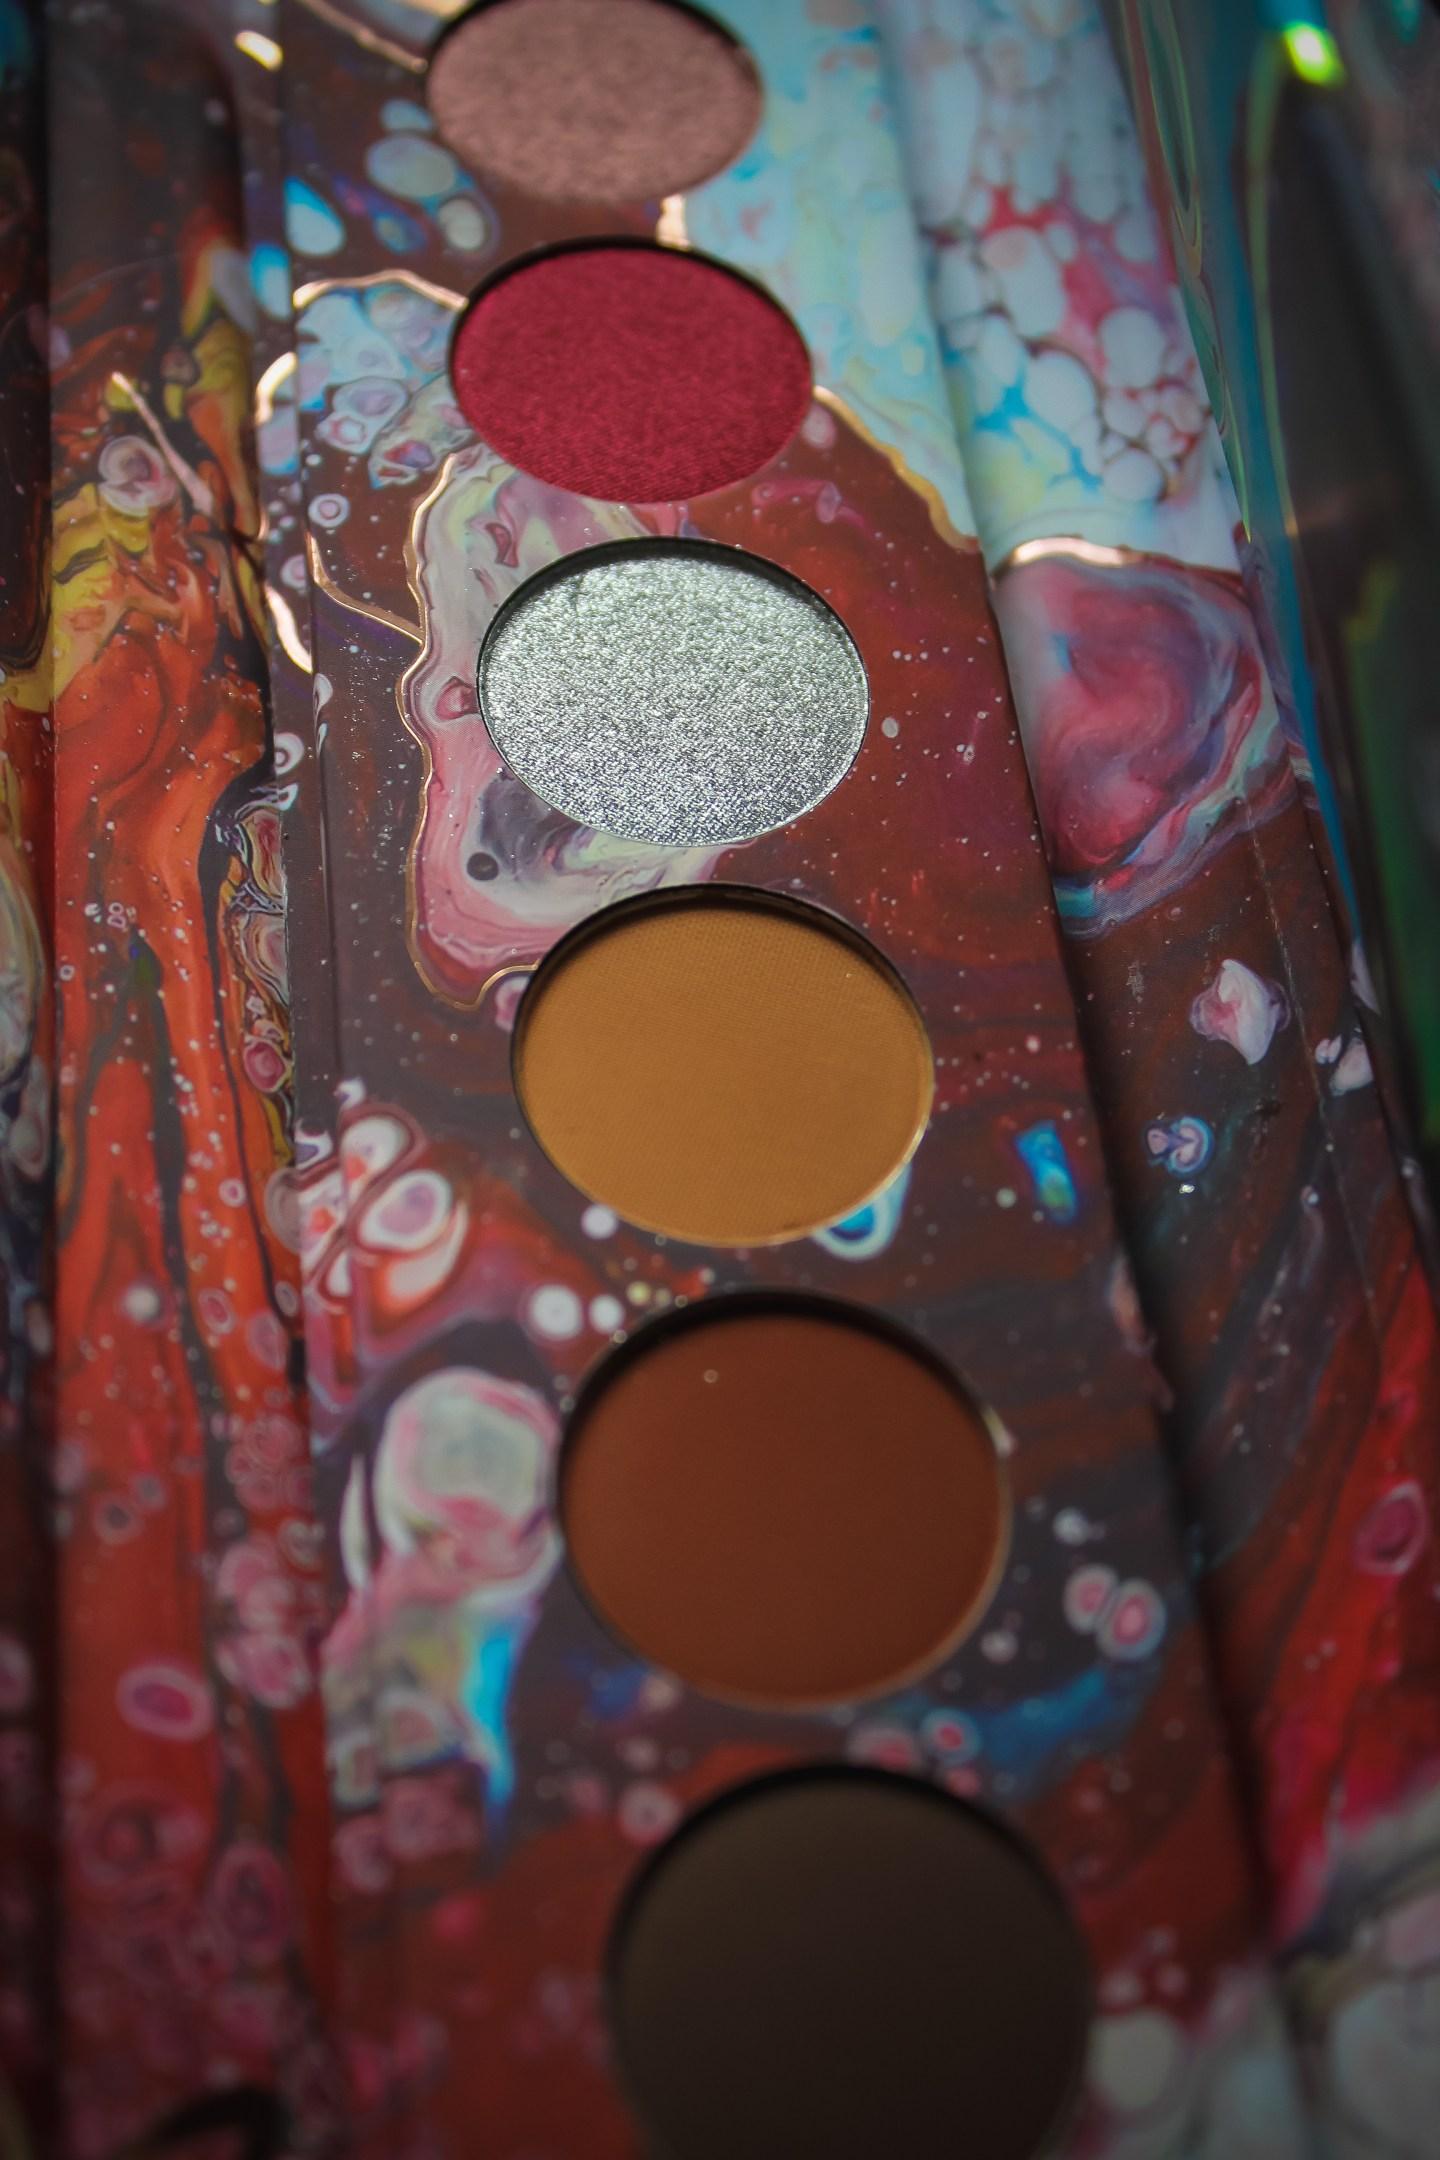 Kaleidos Makeup Futurism I-III Palettes Review 6